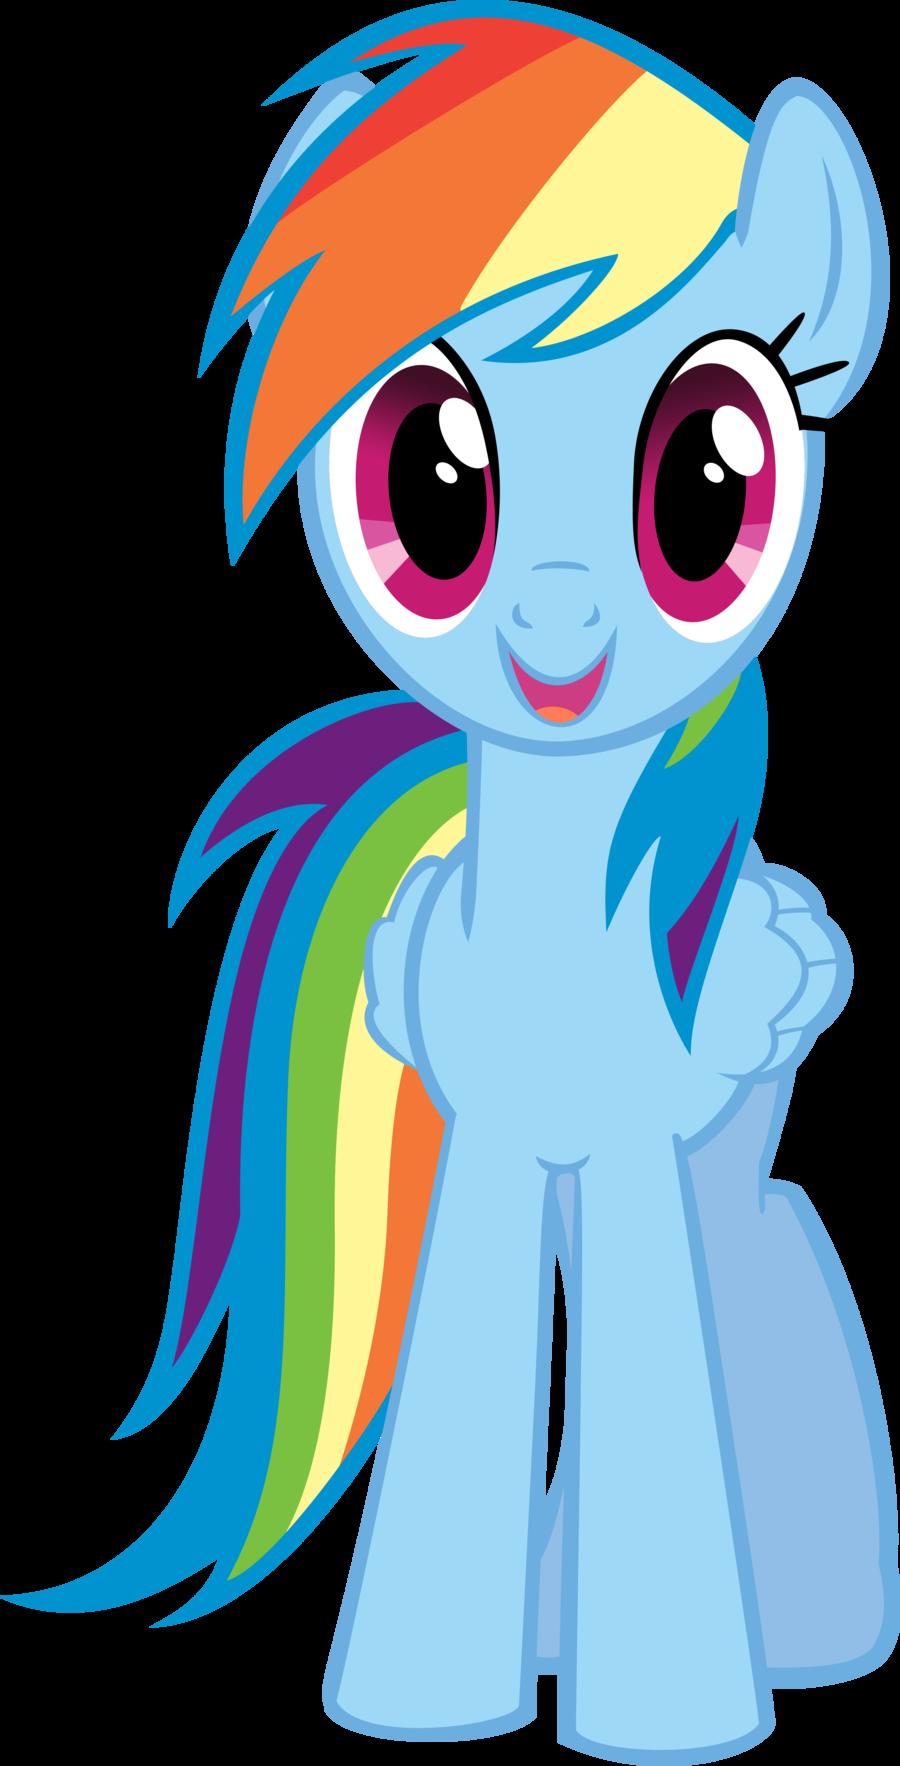 Dash goanimate v wiki. Clipart rainbow pony